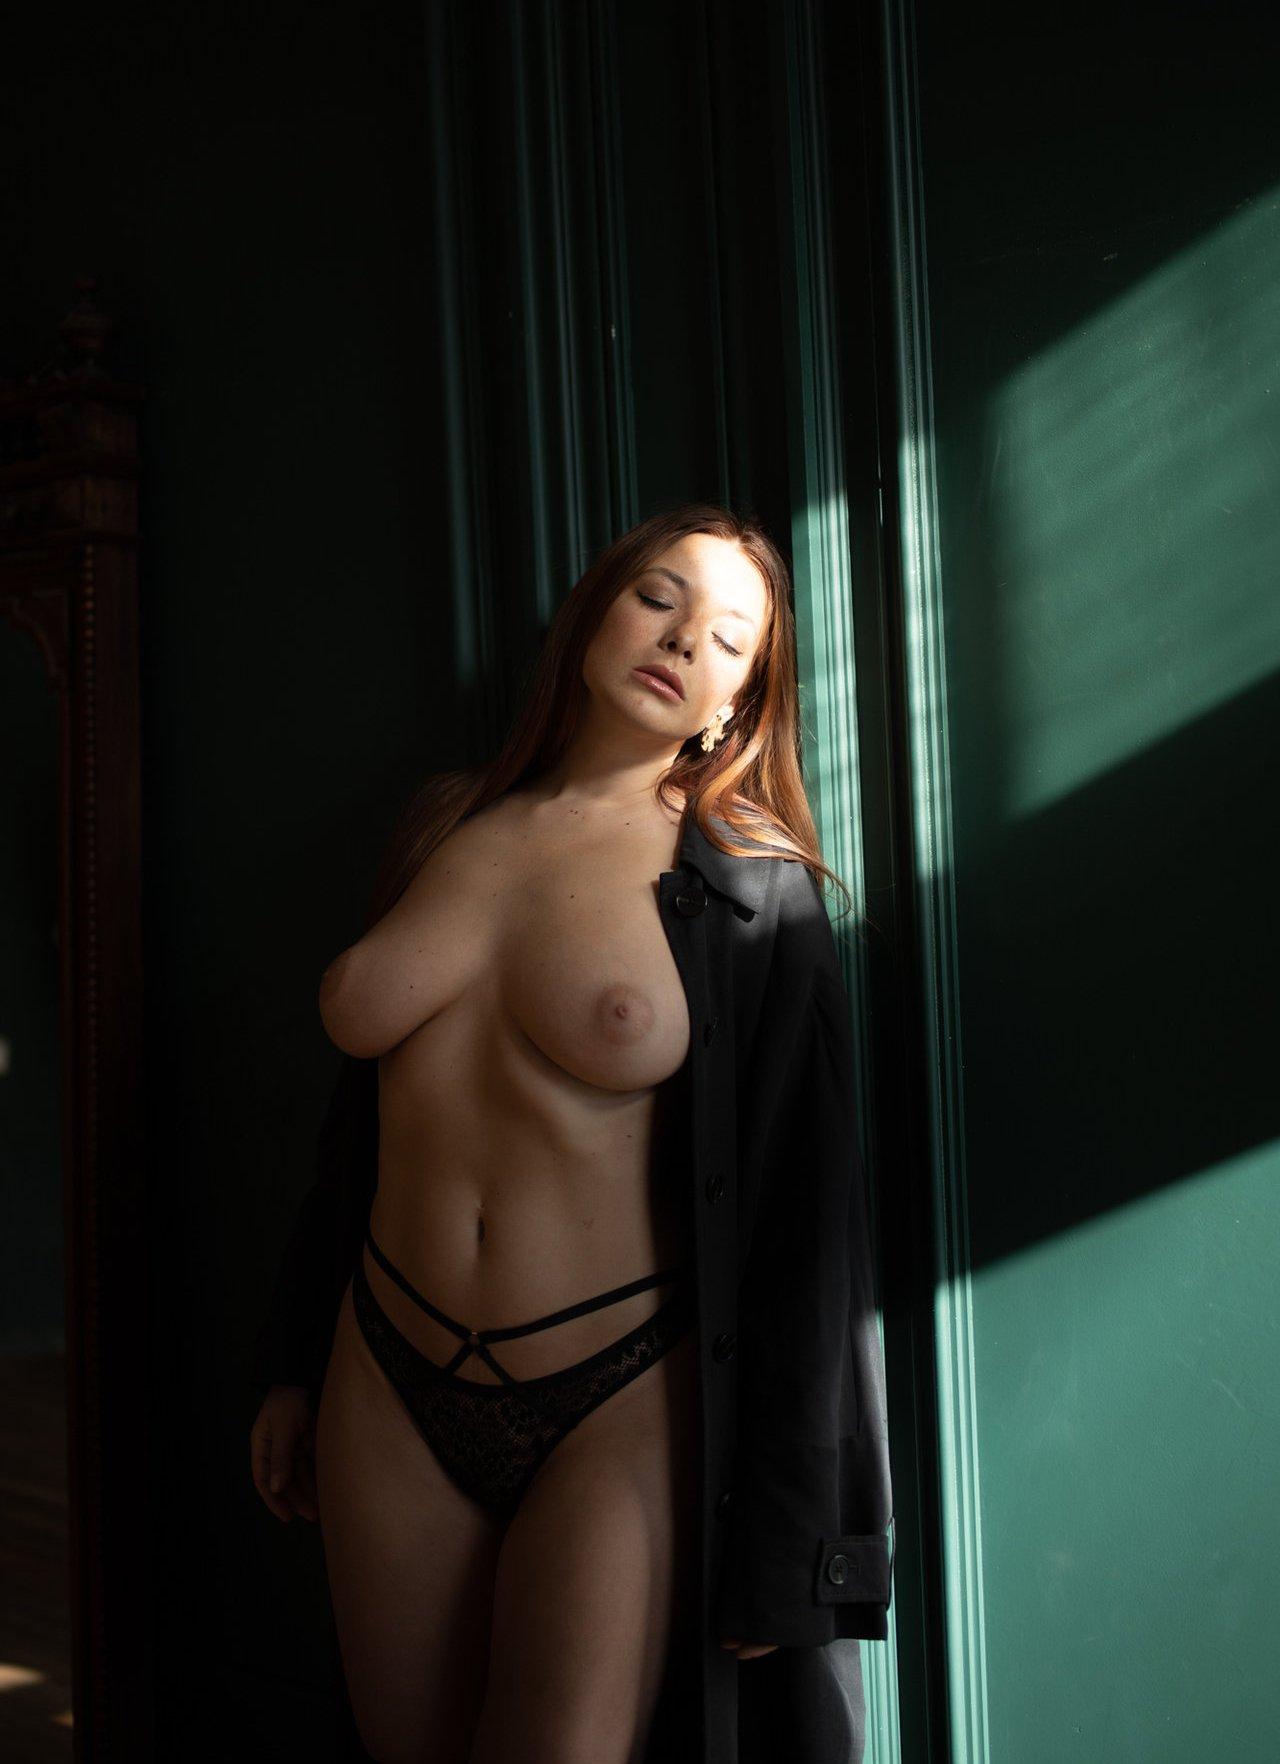 Olga Kobzar Bugs Bunny Gf Nudes Leaks 0021